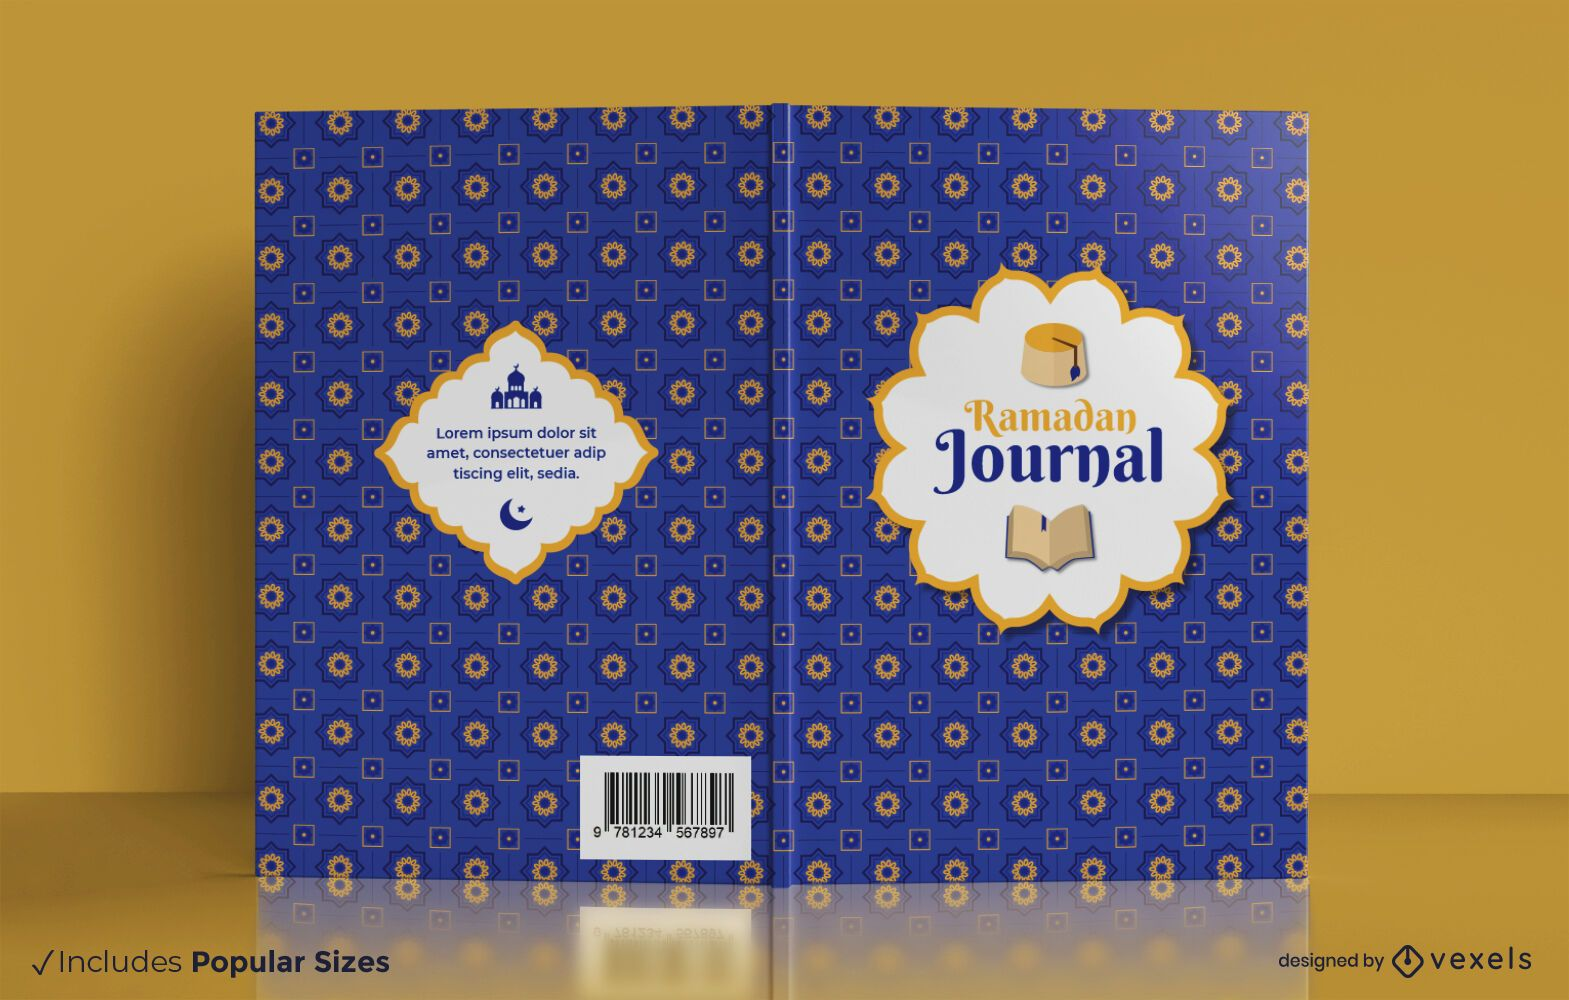 Ramadan journal book cover design